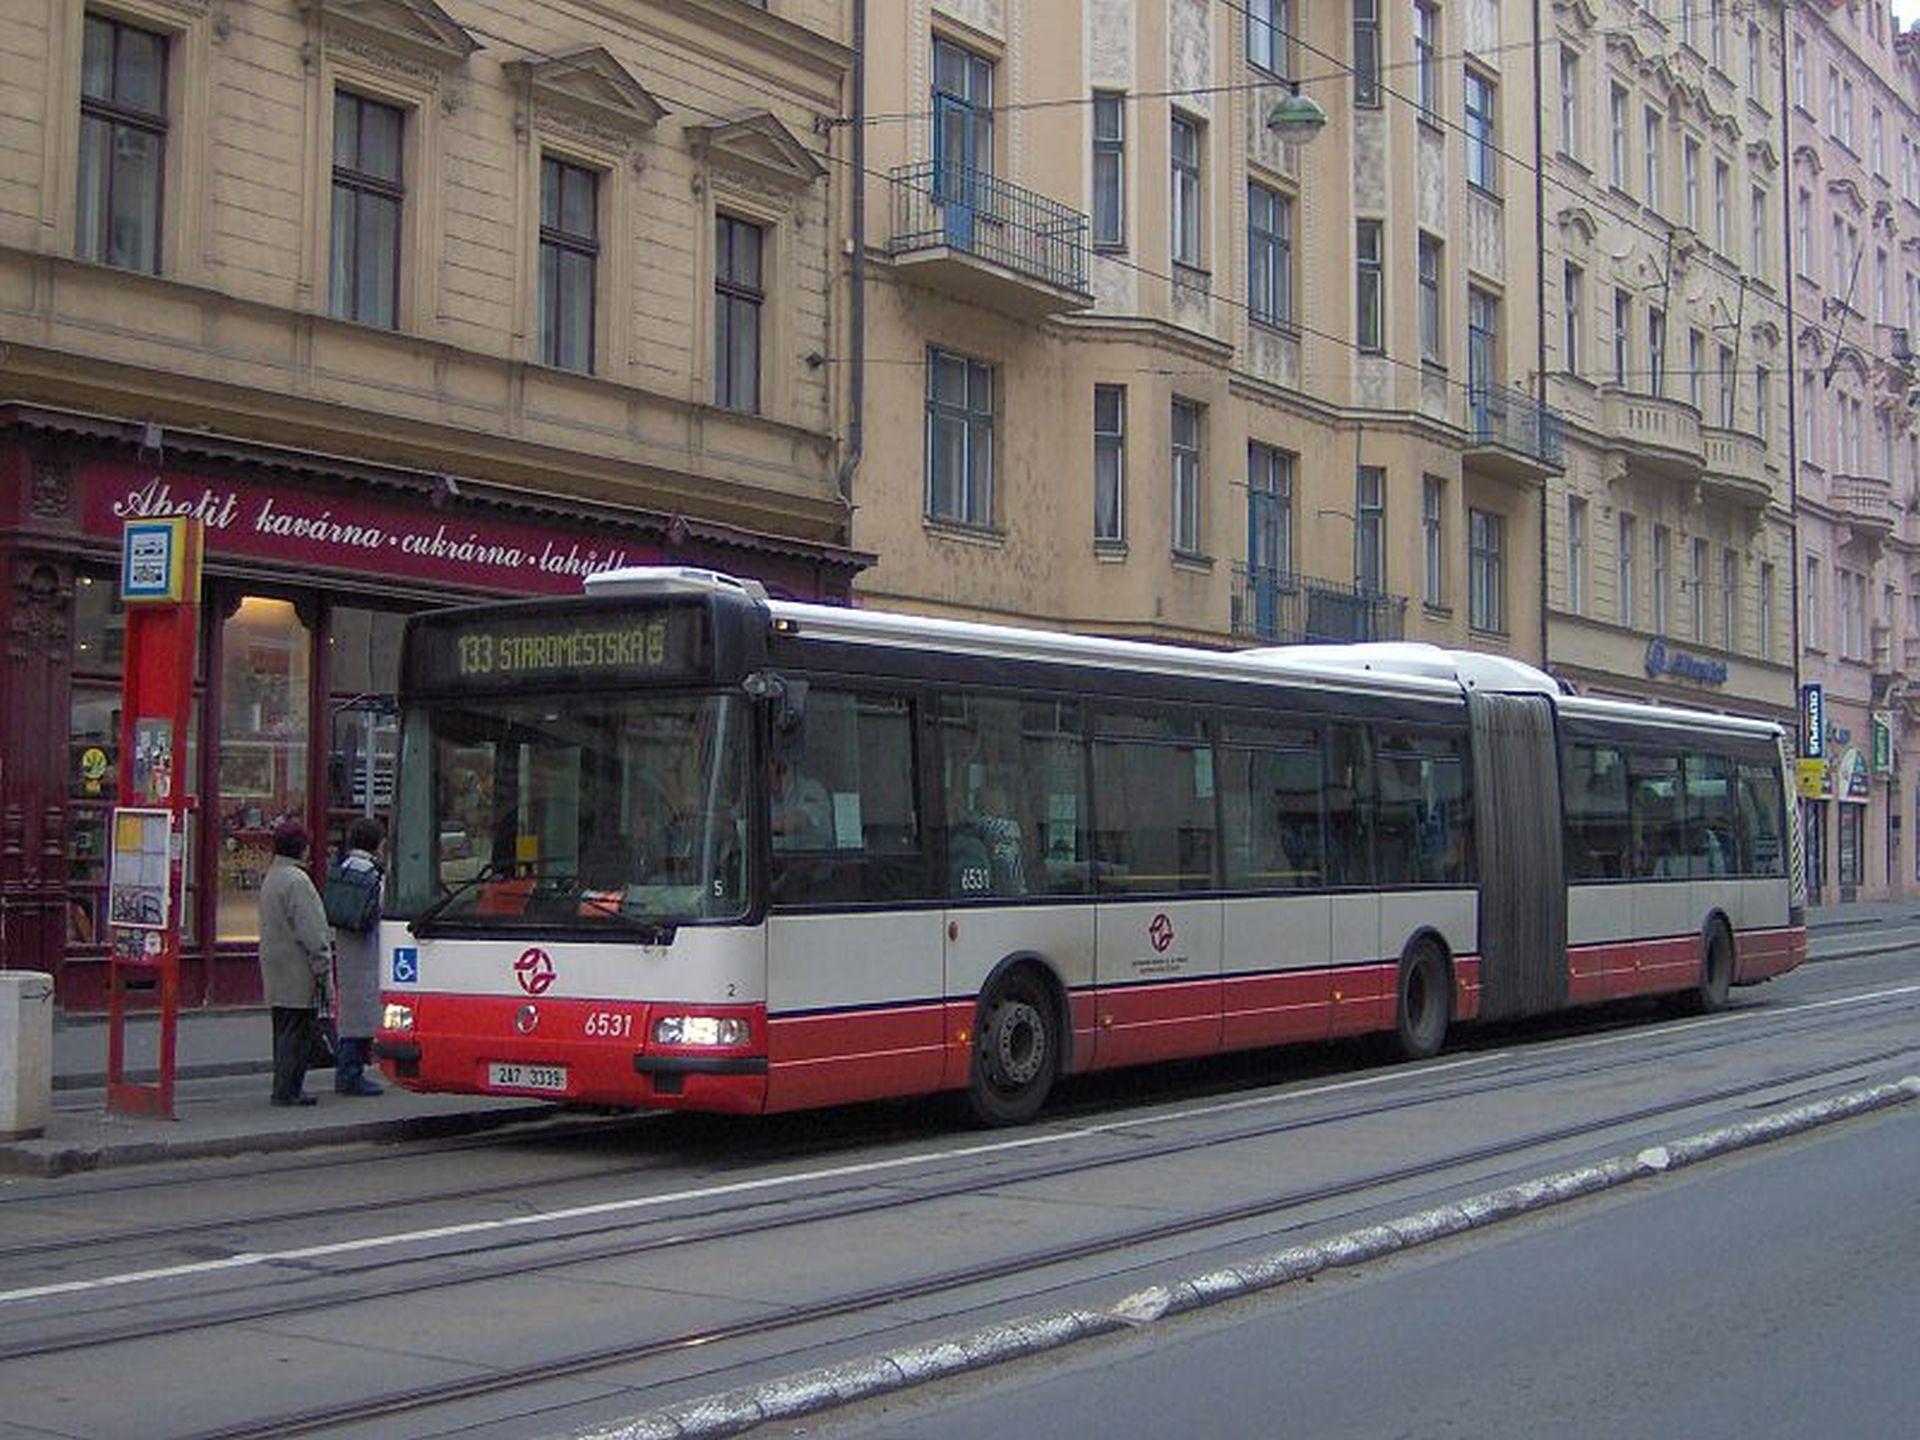 Autobus IrisBus Citybus v ulicích Prahy. Foto: Harald / Wikimedia Commons